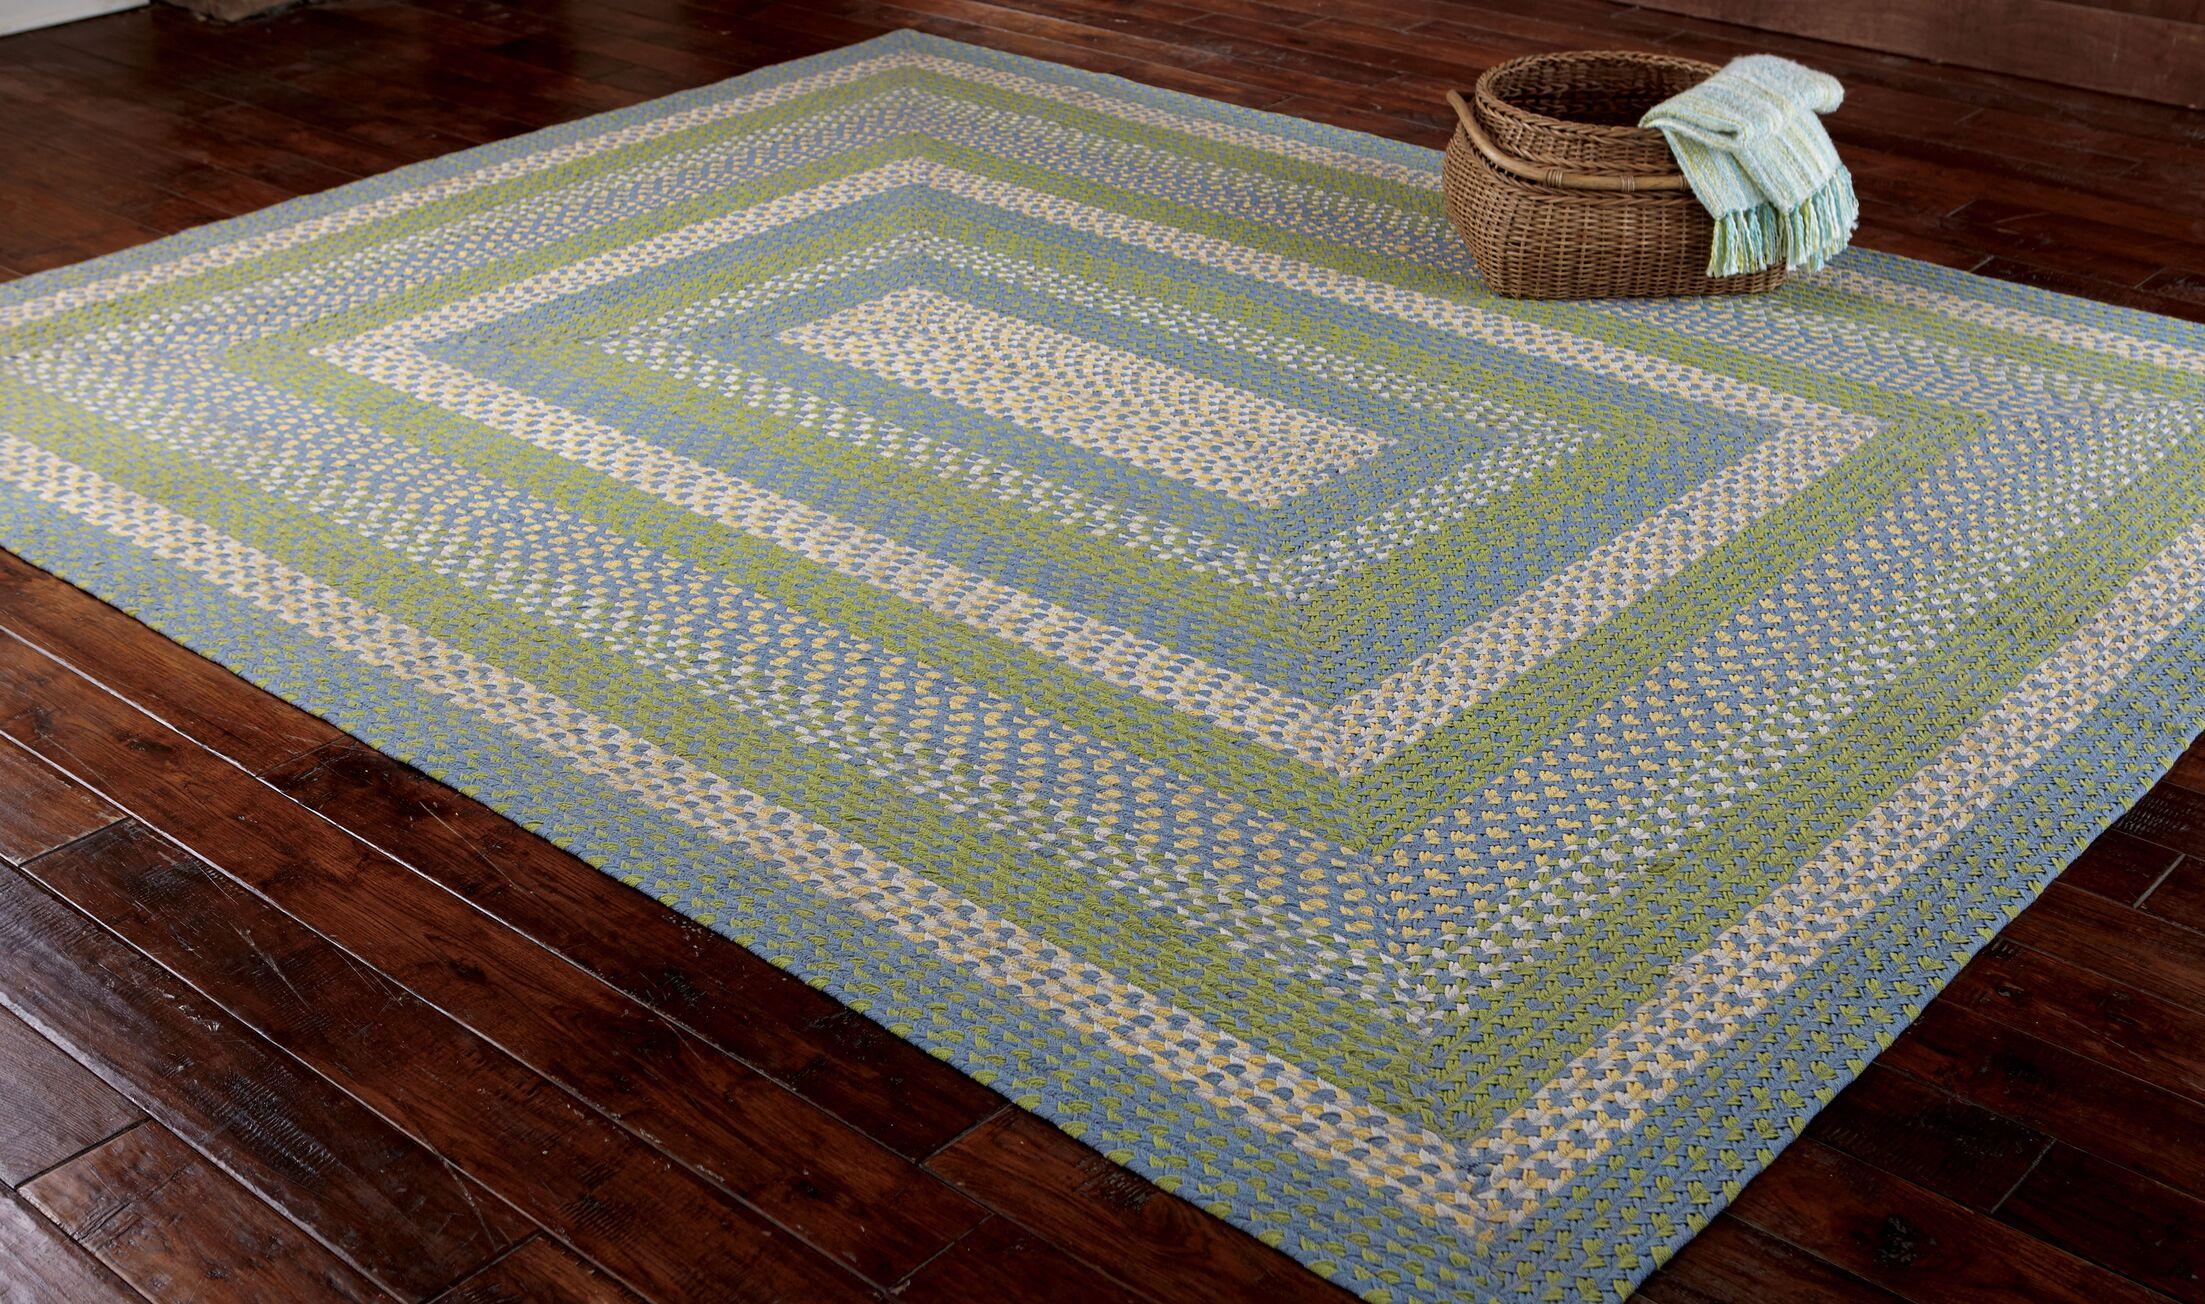 Sarasota Blue/Green Area Rug Rug Size: Rectangle 8' x 10'